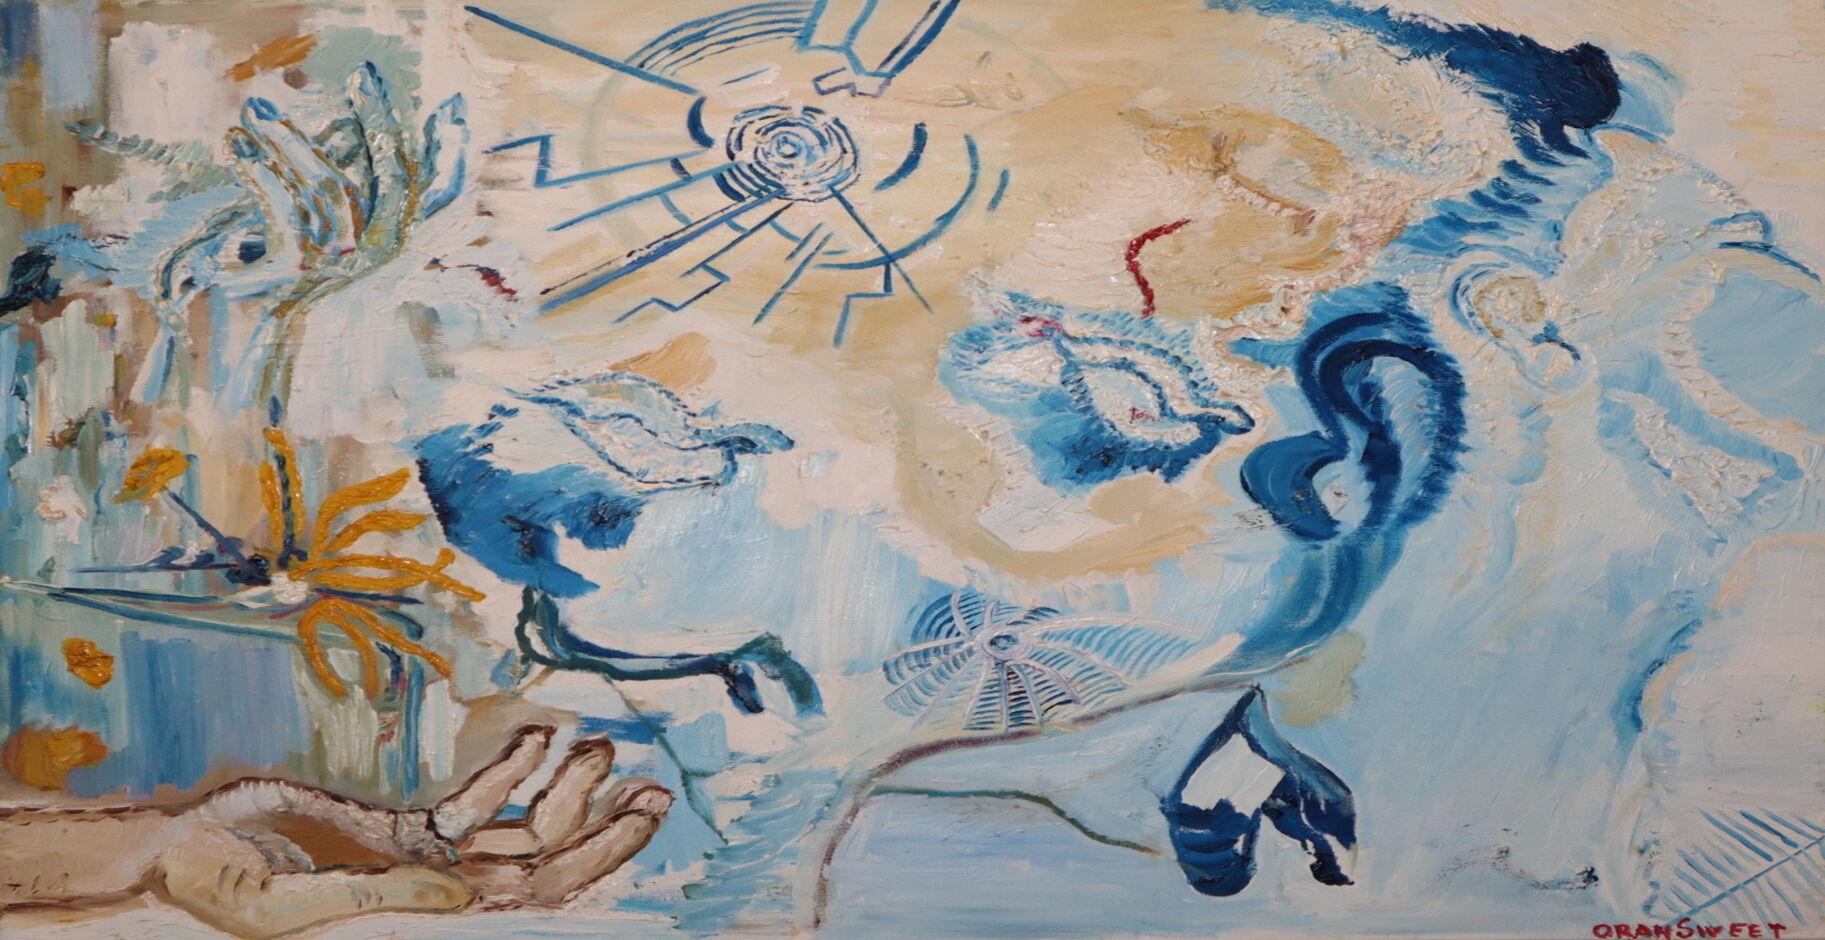 Air oil paint ORAHART Israeli painter – Swetlana Zakharyan